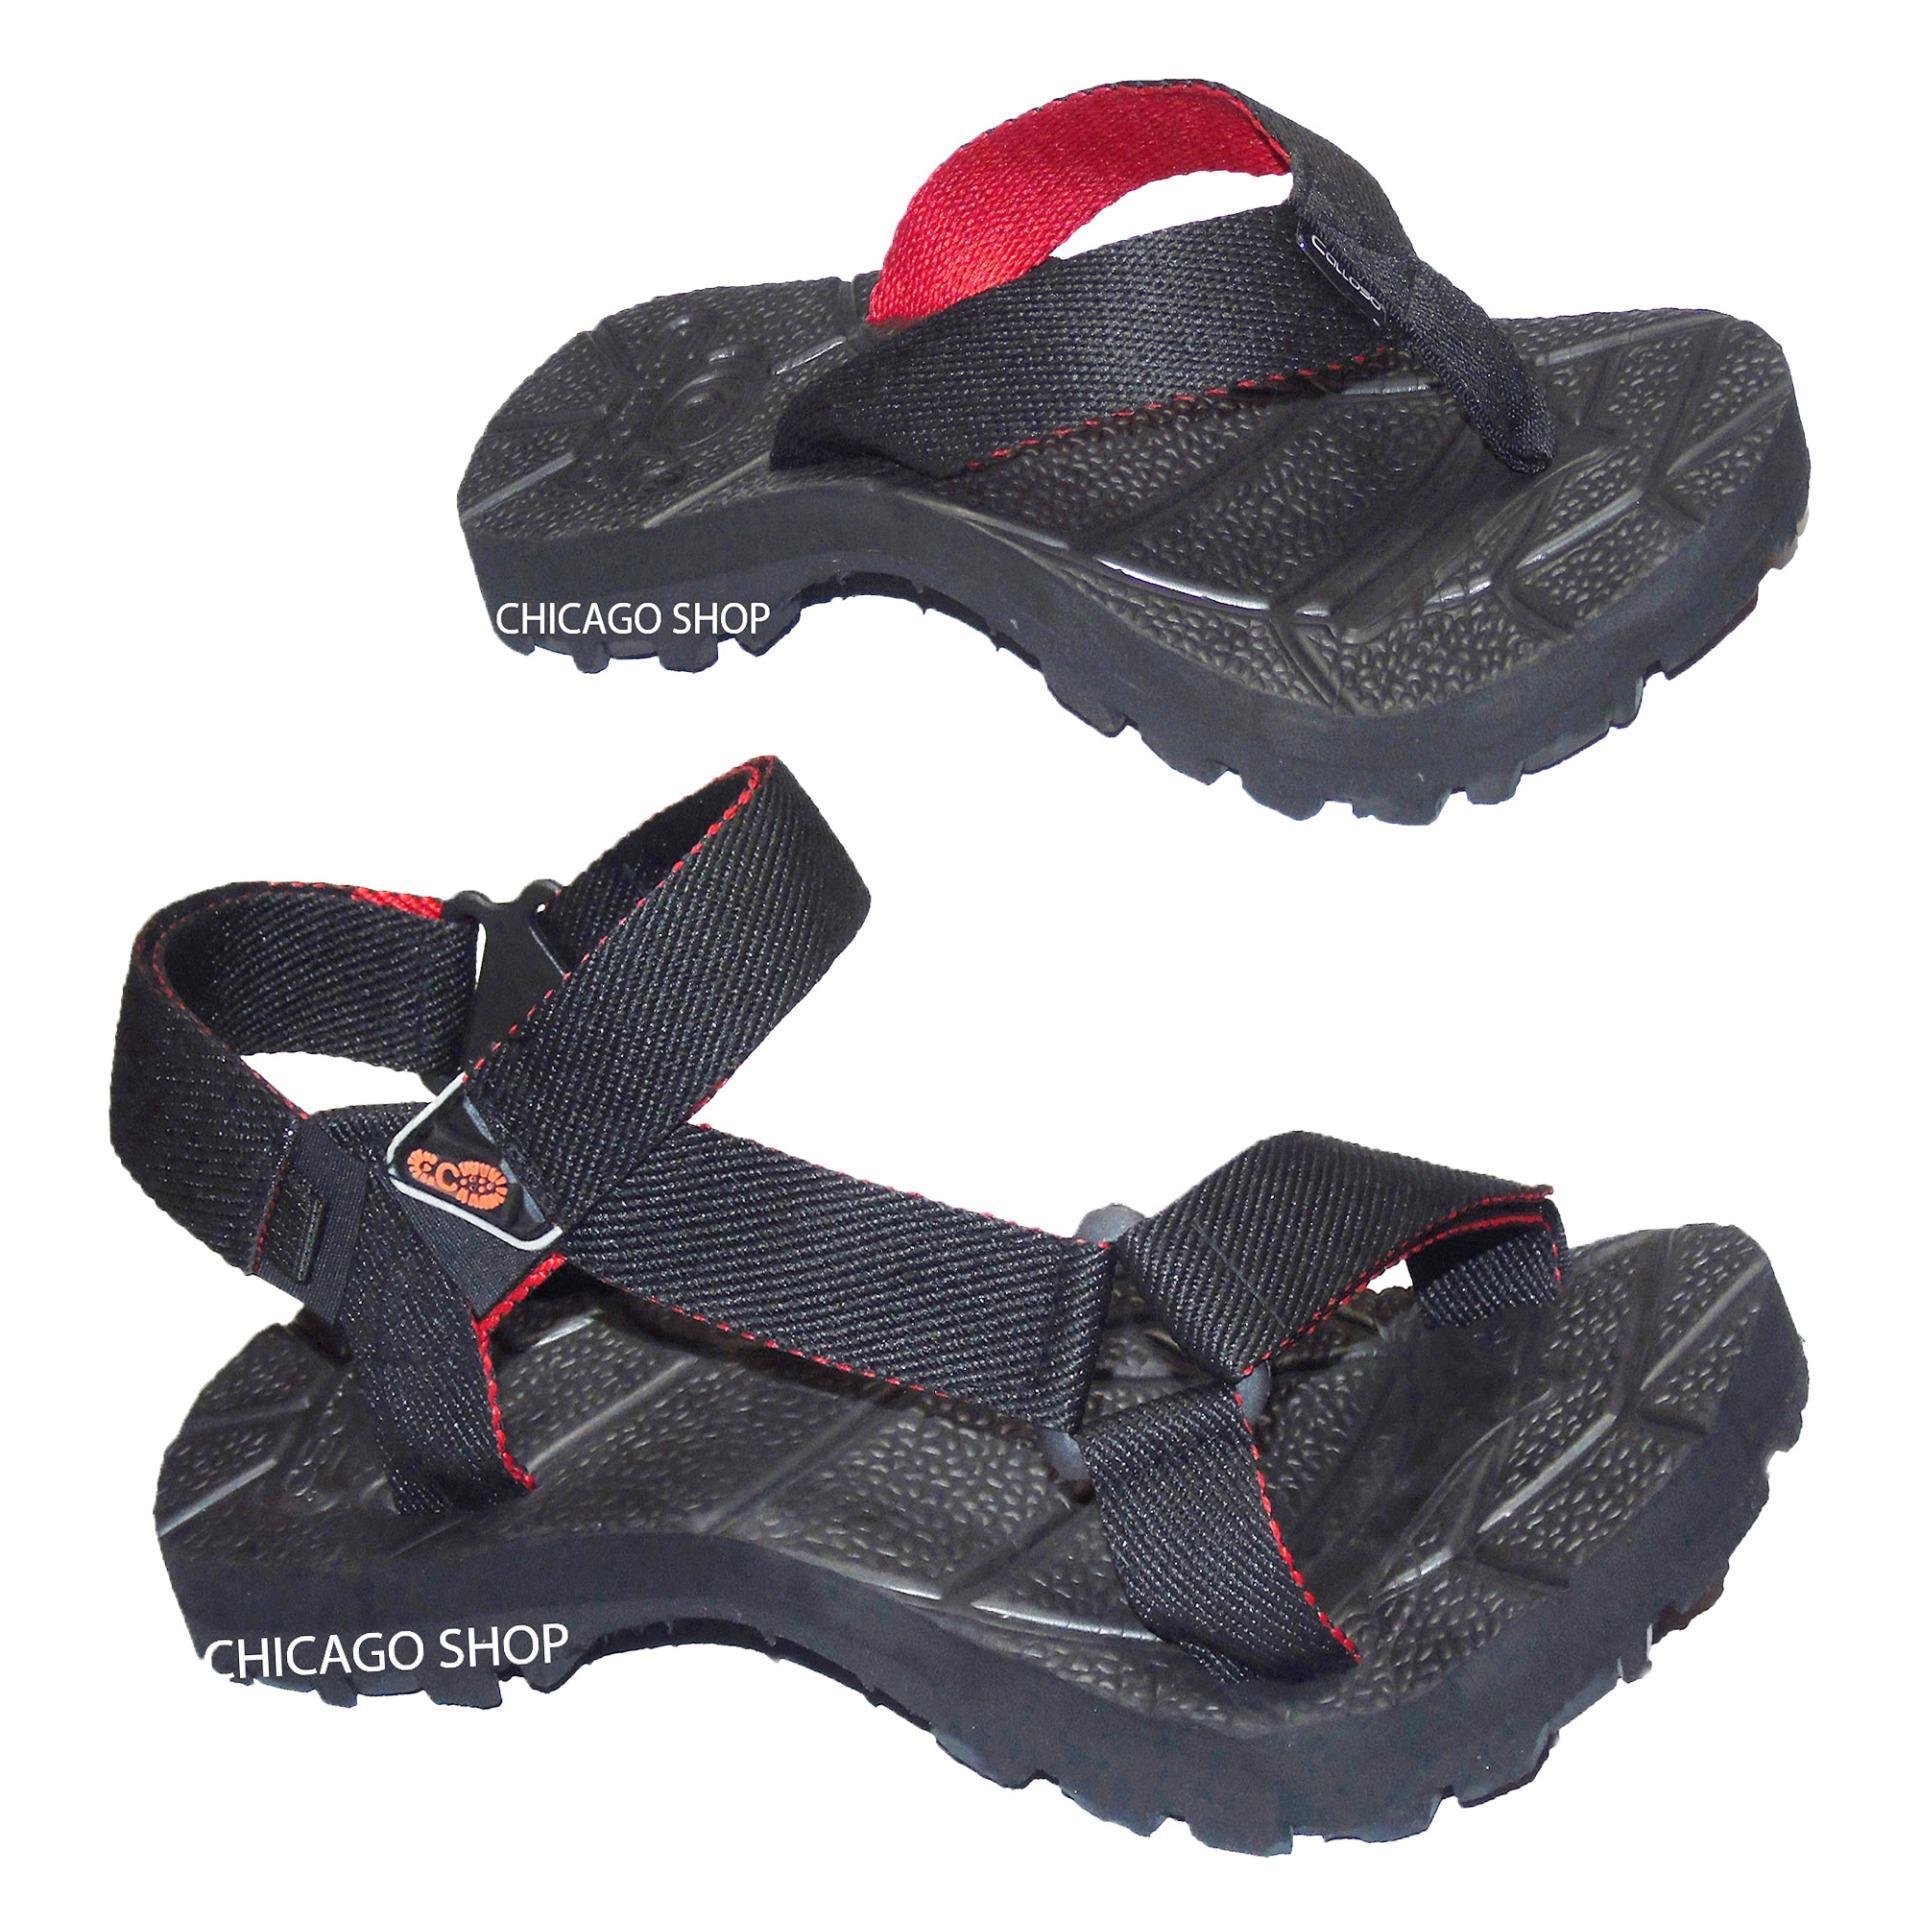 Beli Sepatu Sandal Gunung Stc01 Jpc01 Htm 2 Psg Cicilan